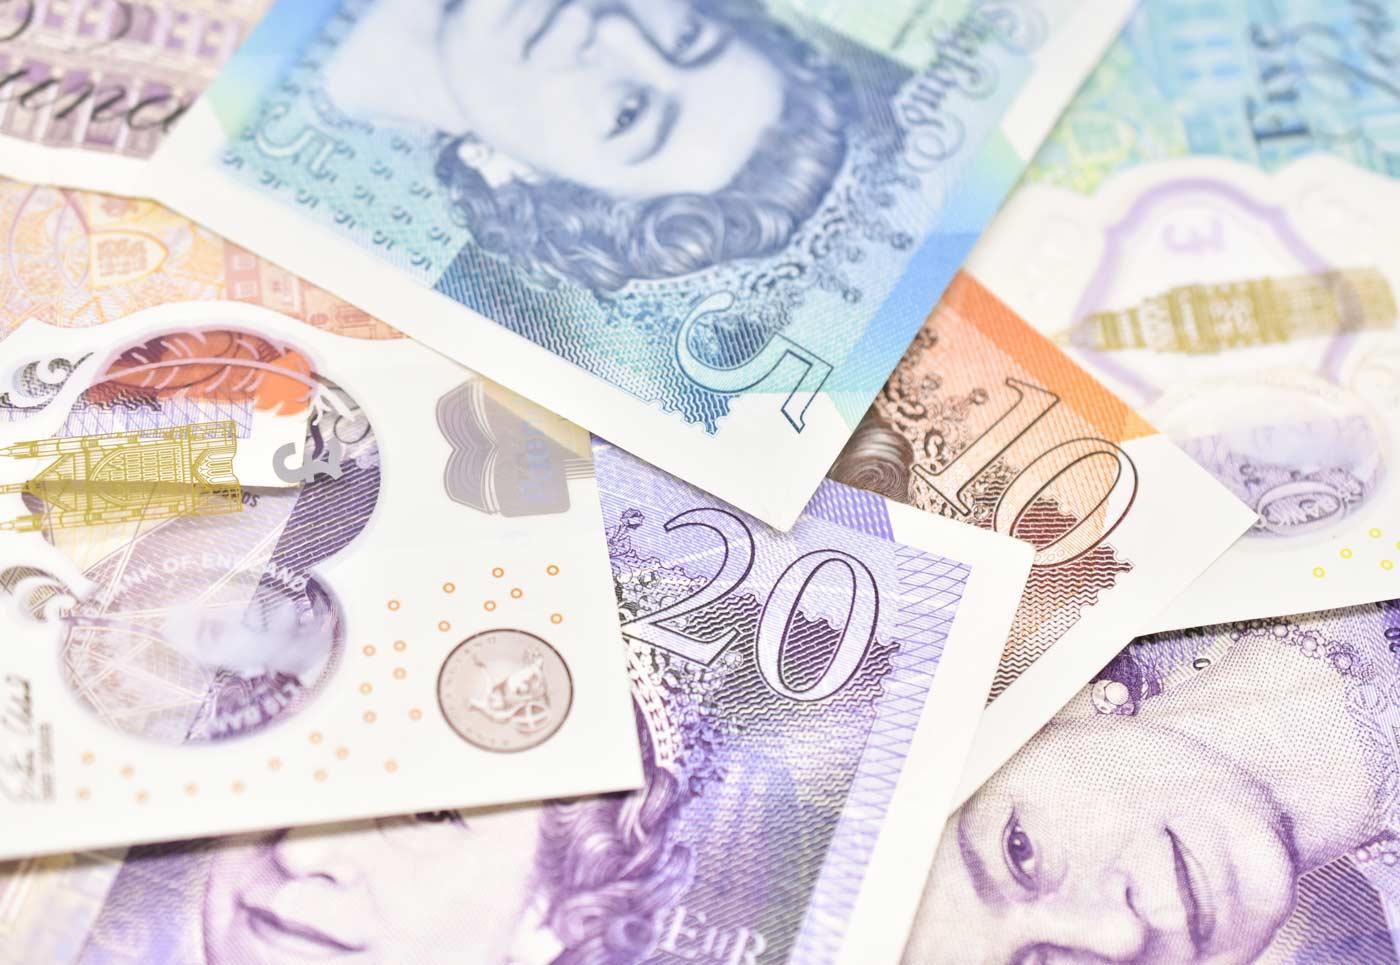 Decision Science | Dirty Money, Marina Jones | UK British bank notes